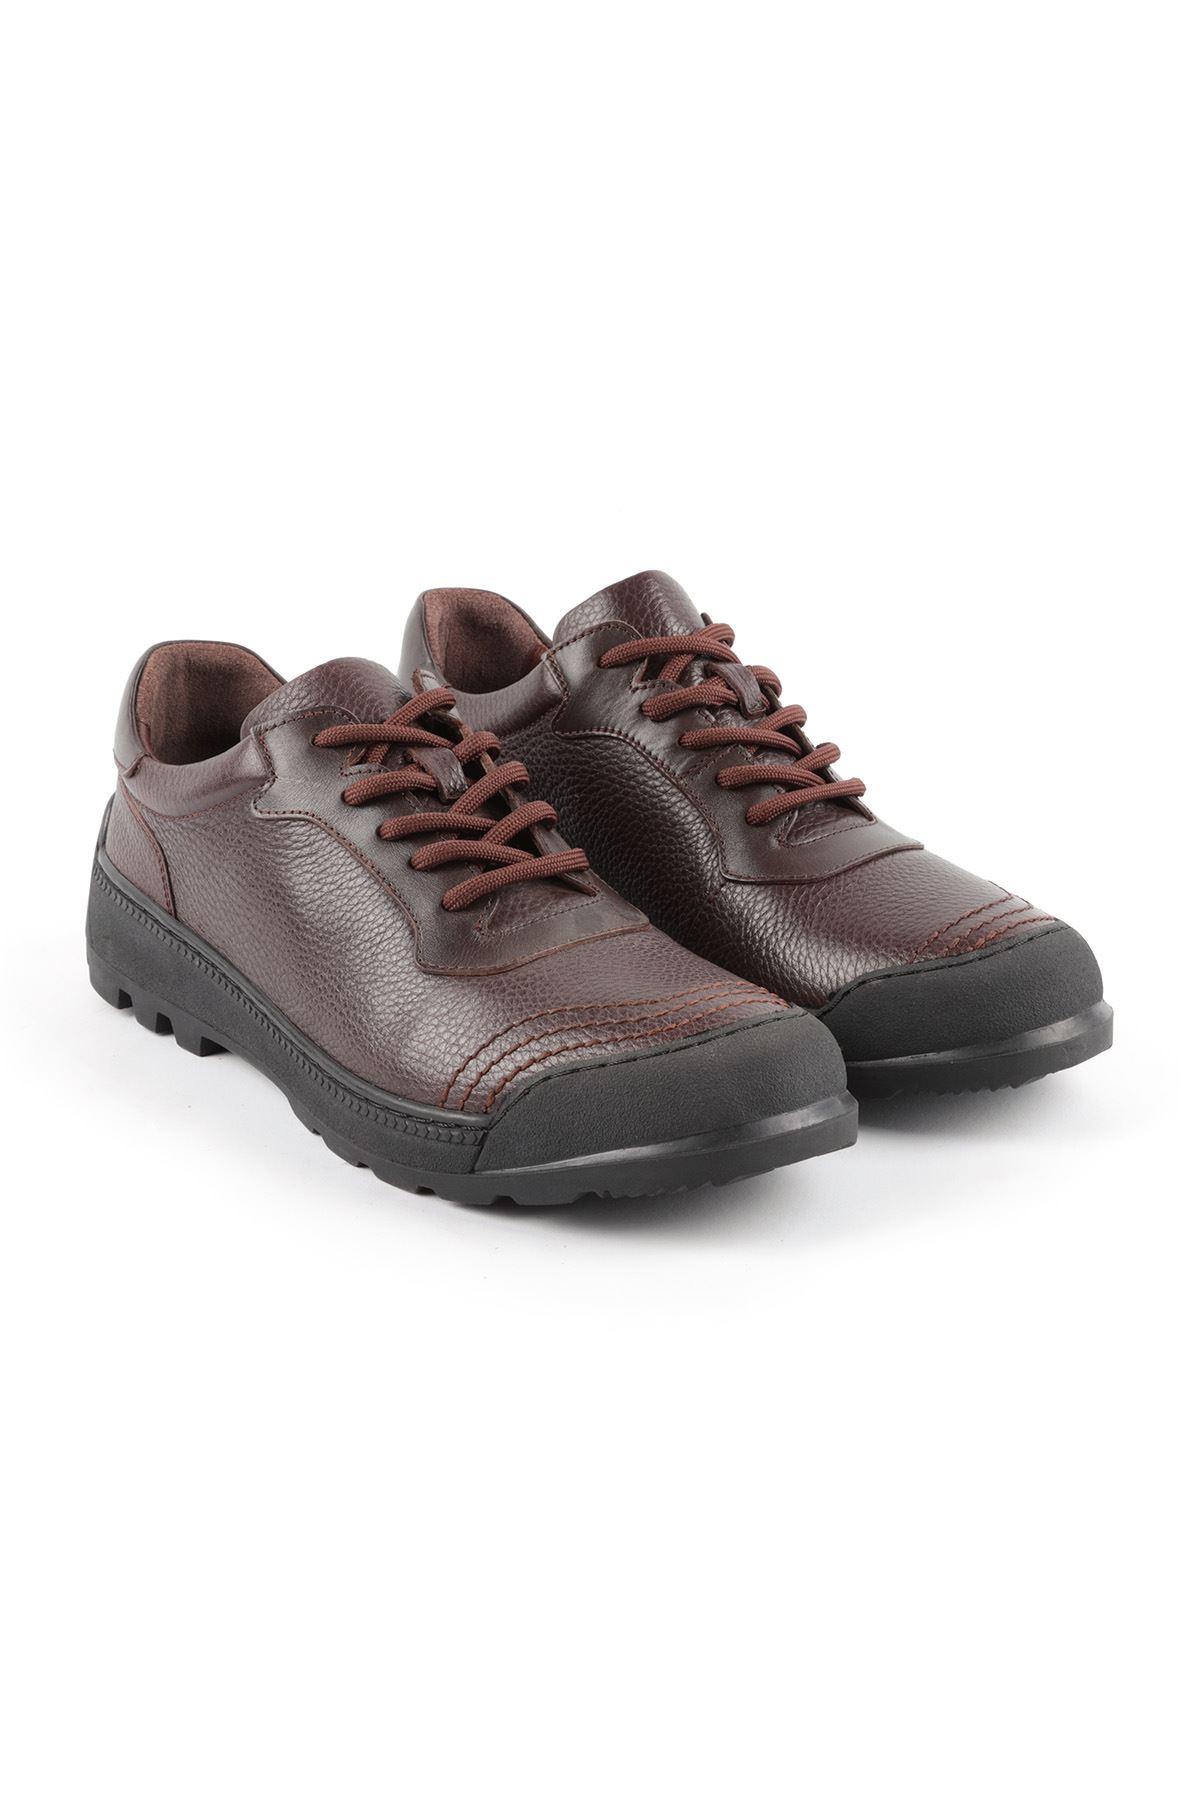 Libero L3178 EA Kahverengi Erkek Ayakkabı